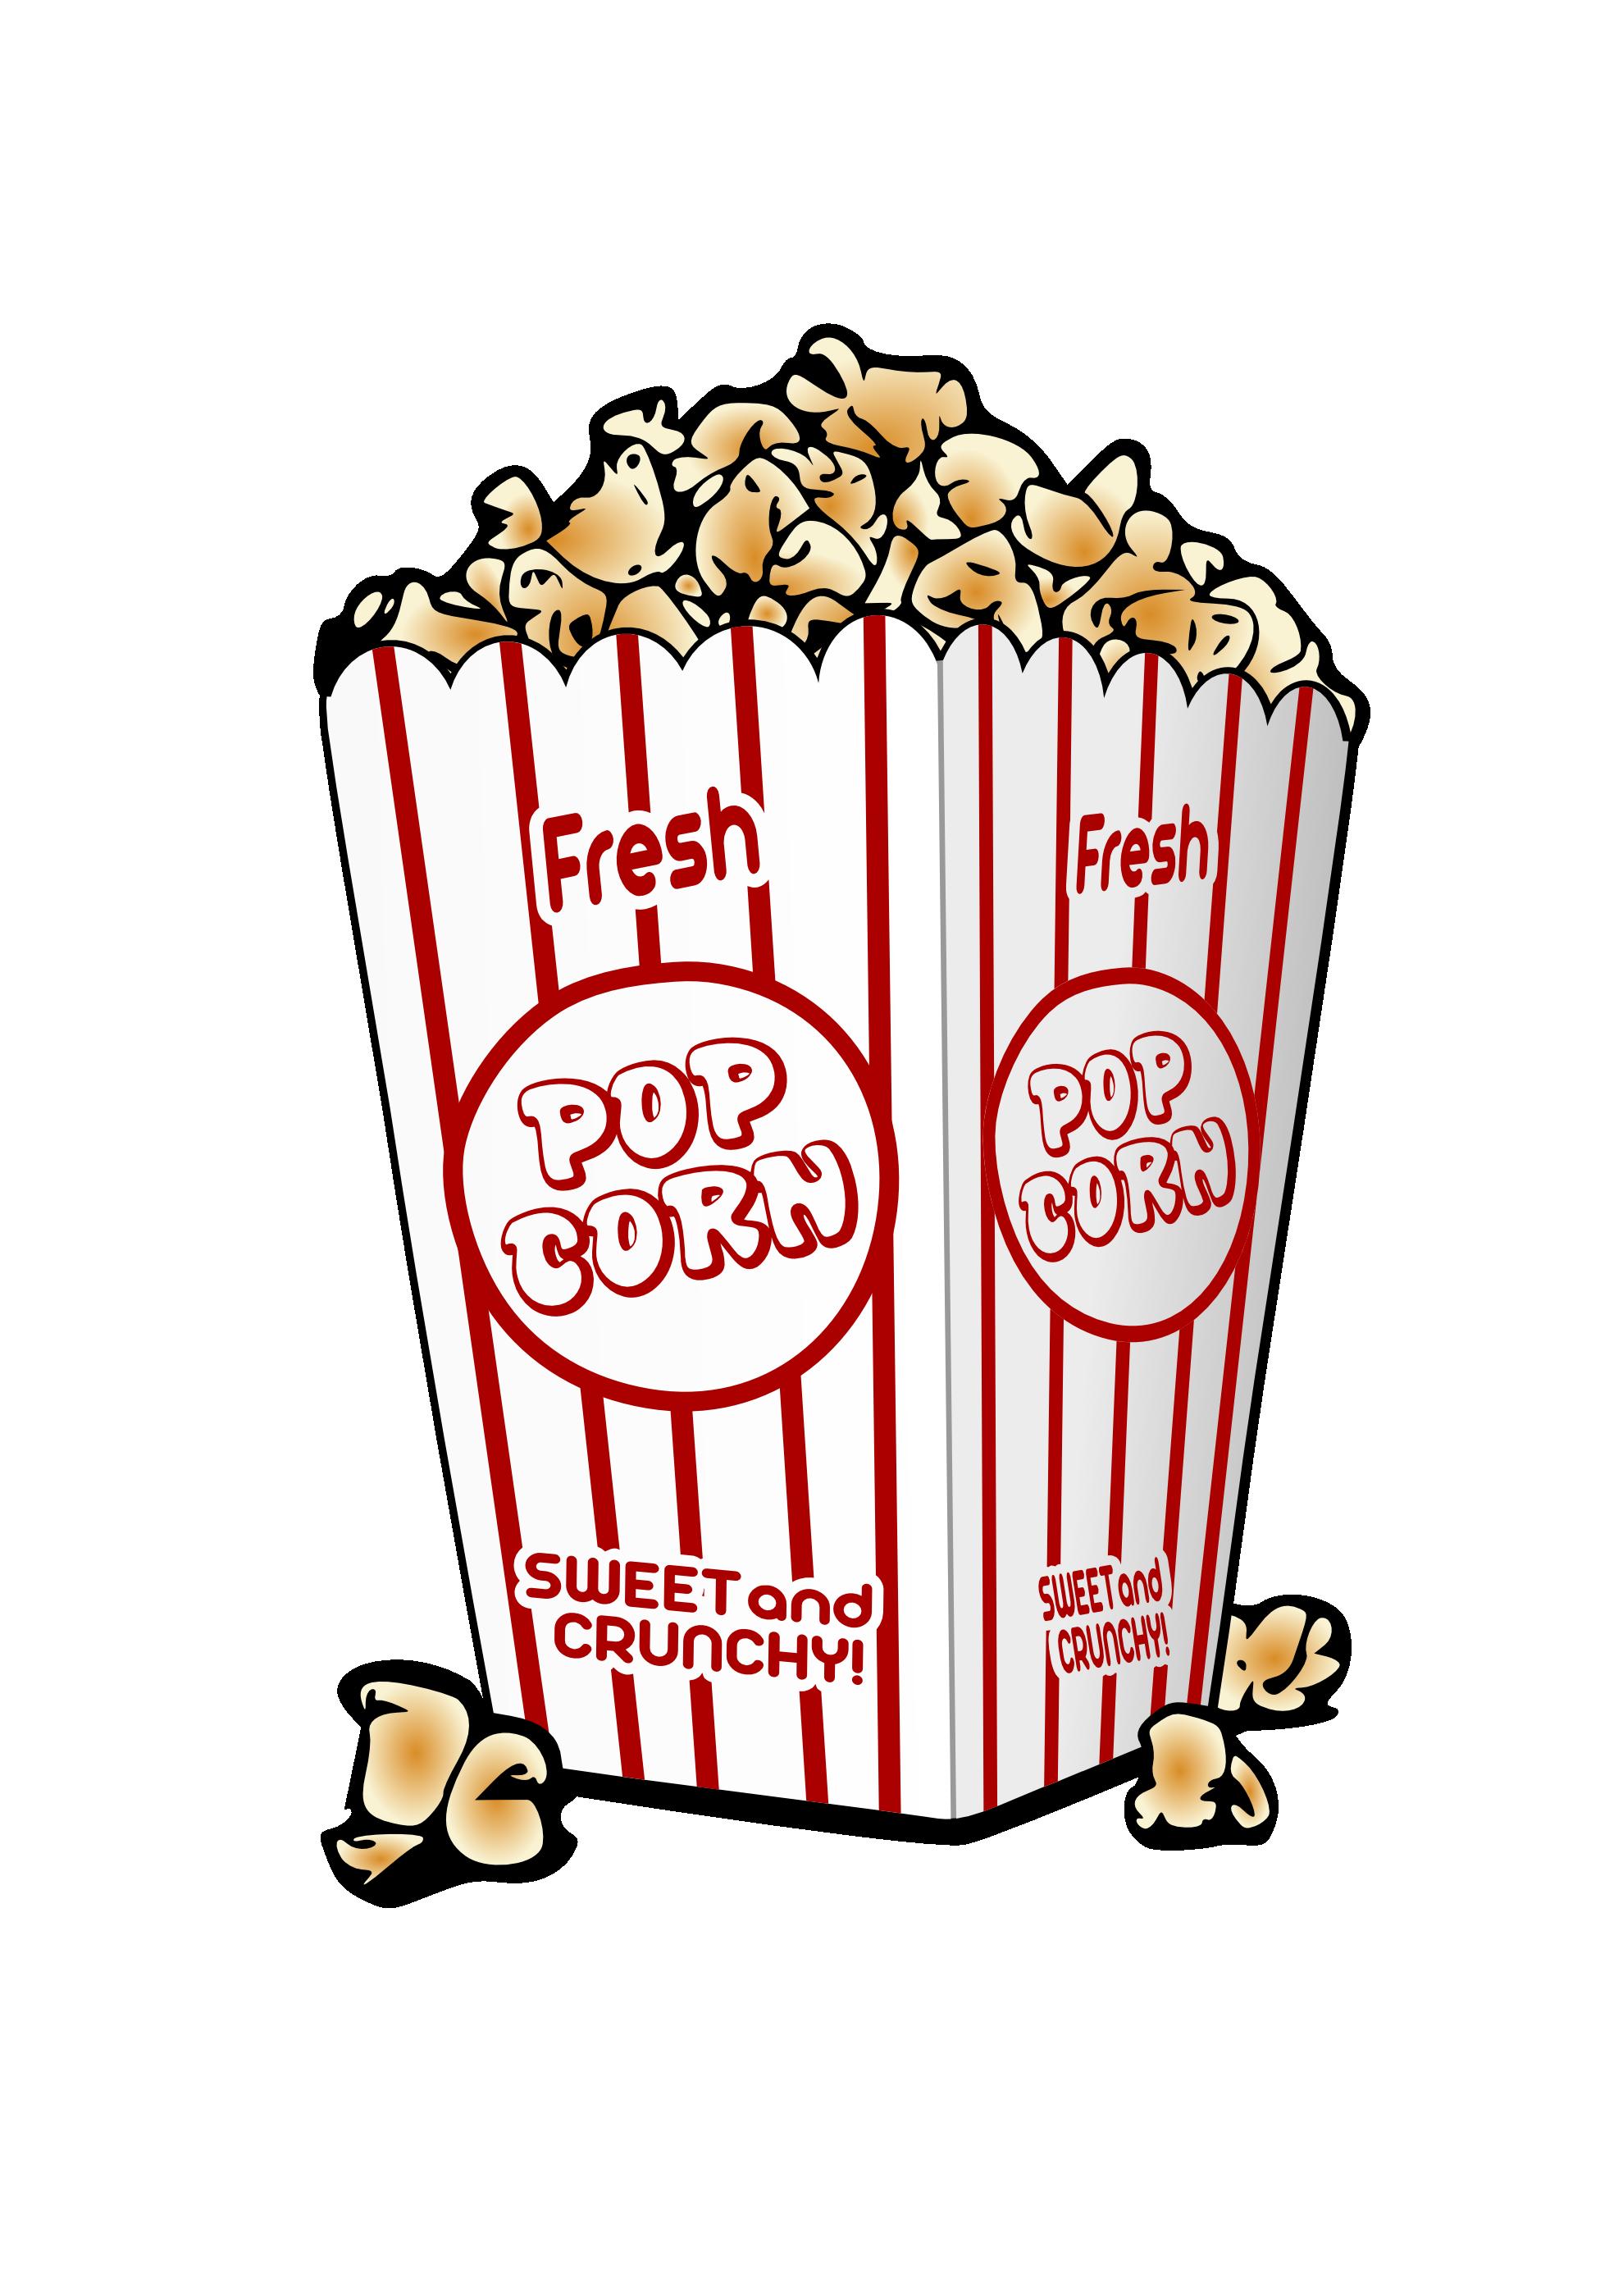 Clip Art Clipart Popcorn popcorn black and white clipart kid 2014 clipartpanda com about terms